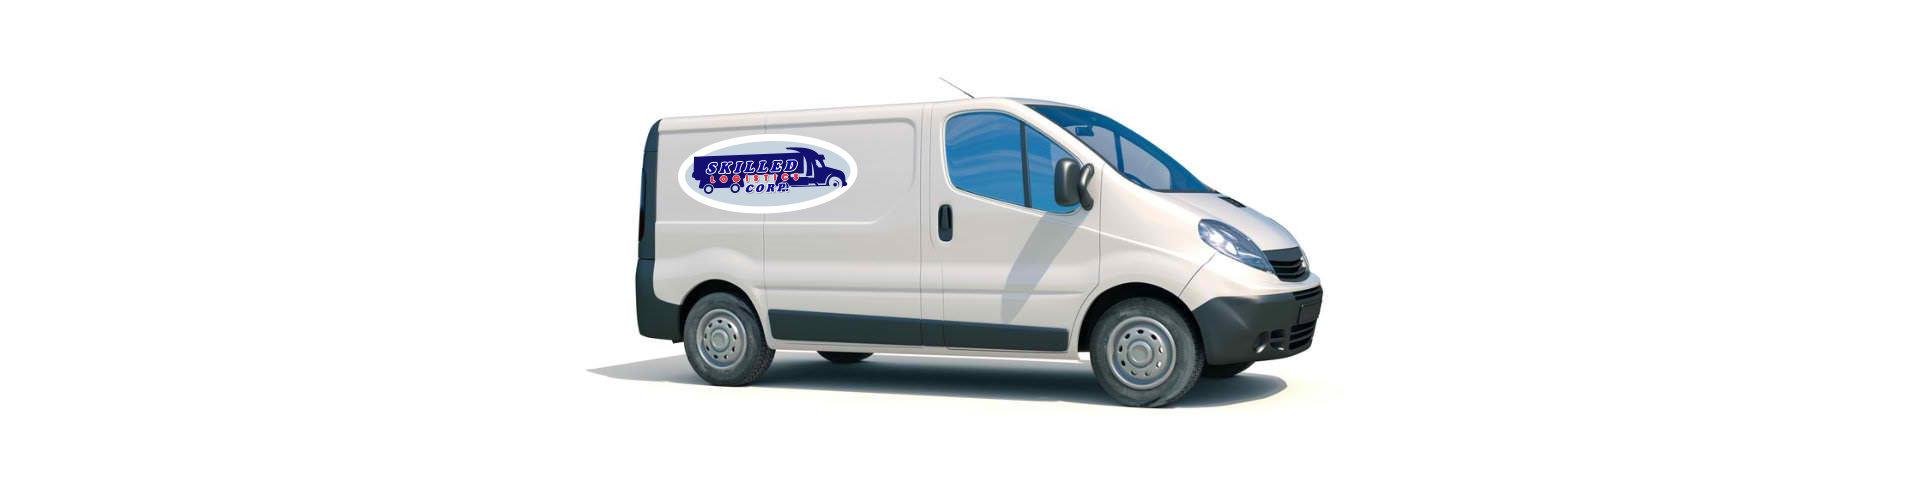 plain white van